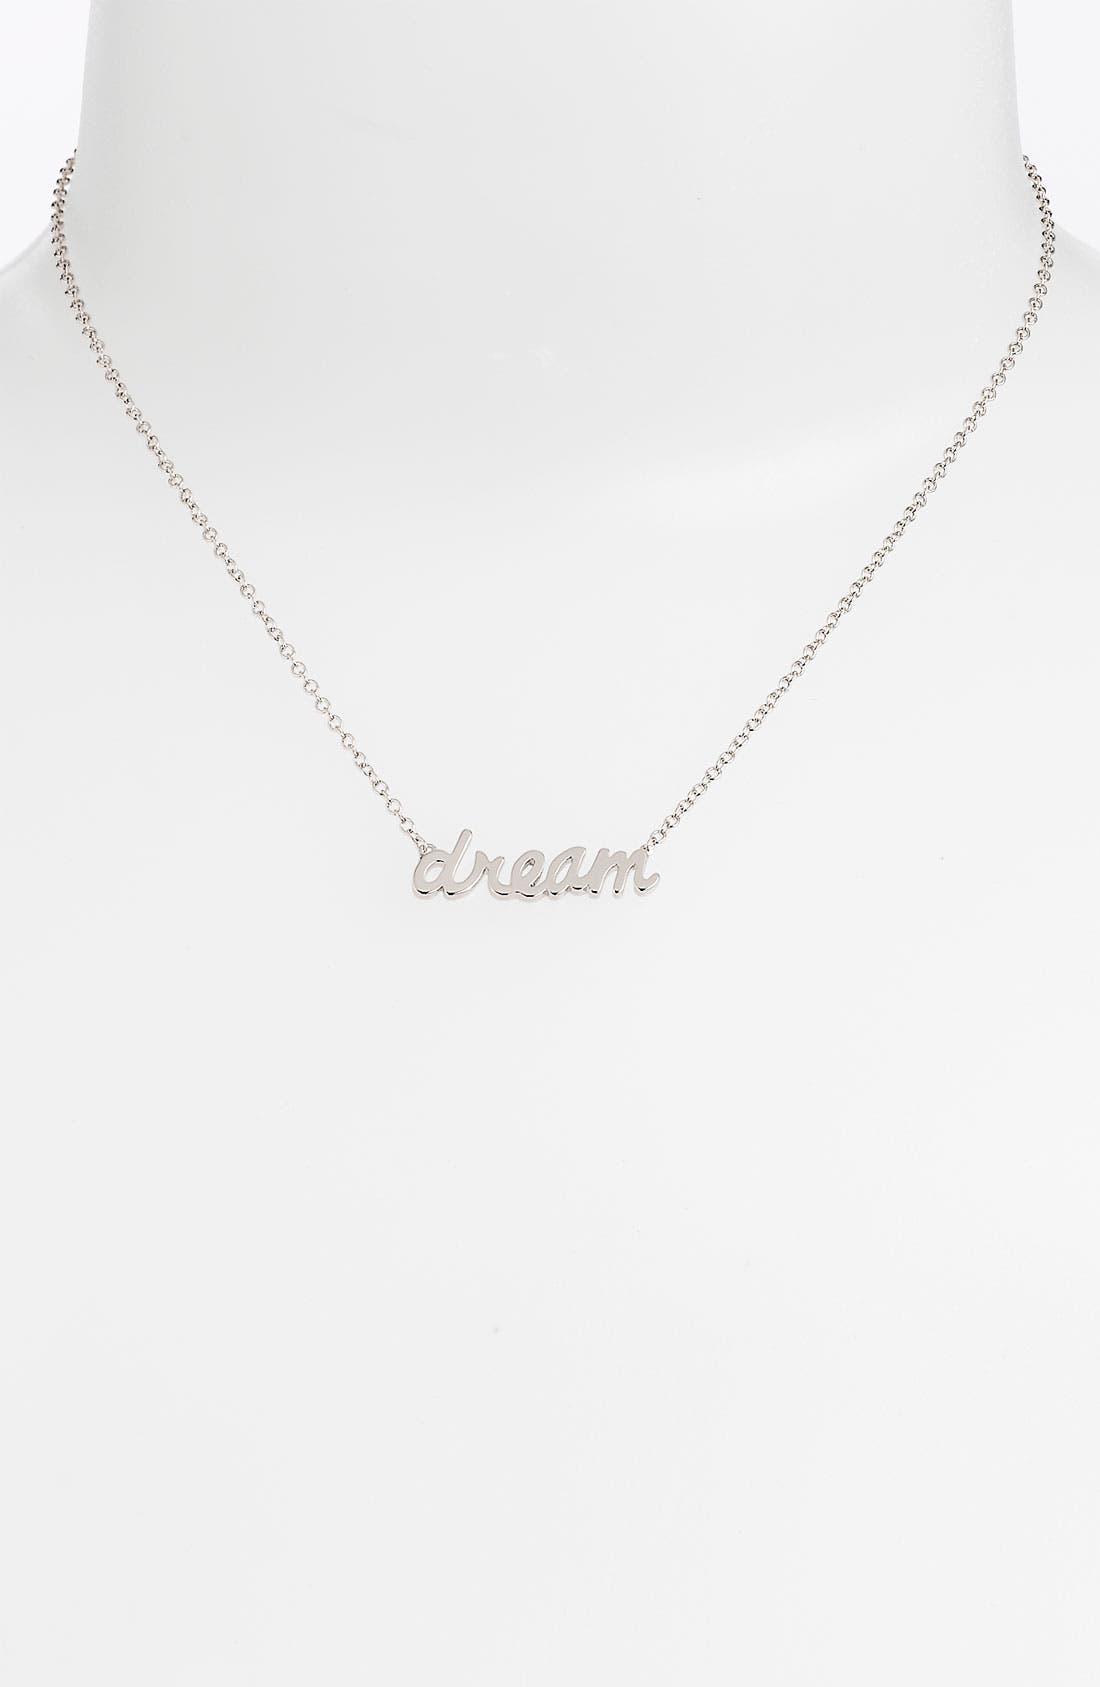 Main Image - Ariella Collection 'Messages - Dream' Script Pendant Necklace (Nordstrom Exclusive)